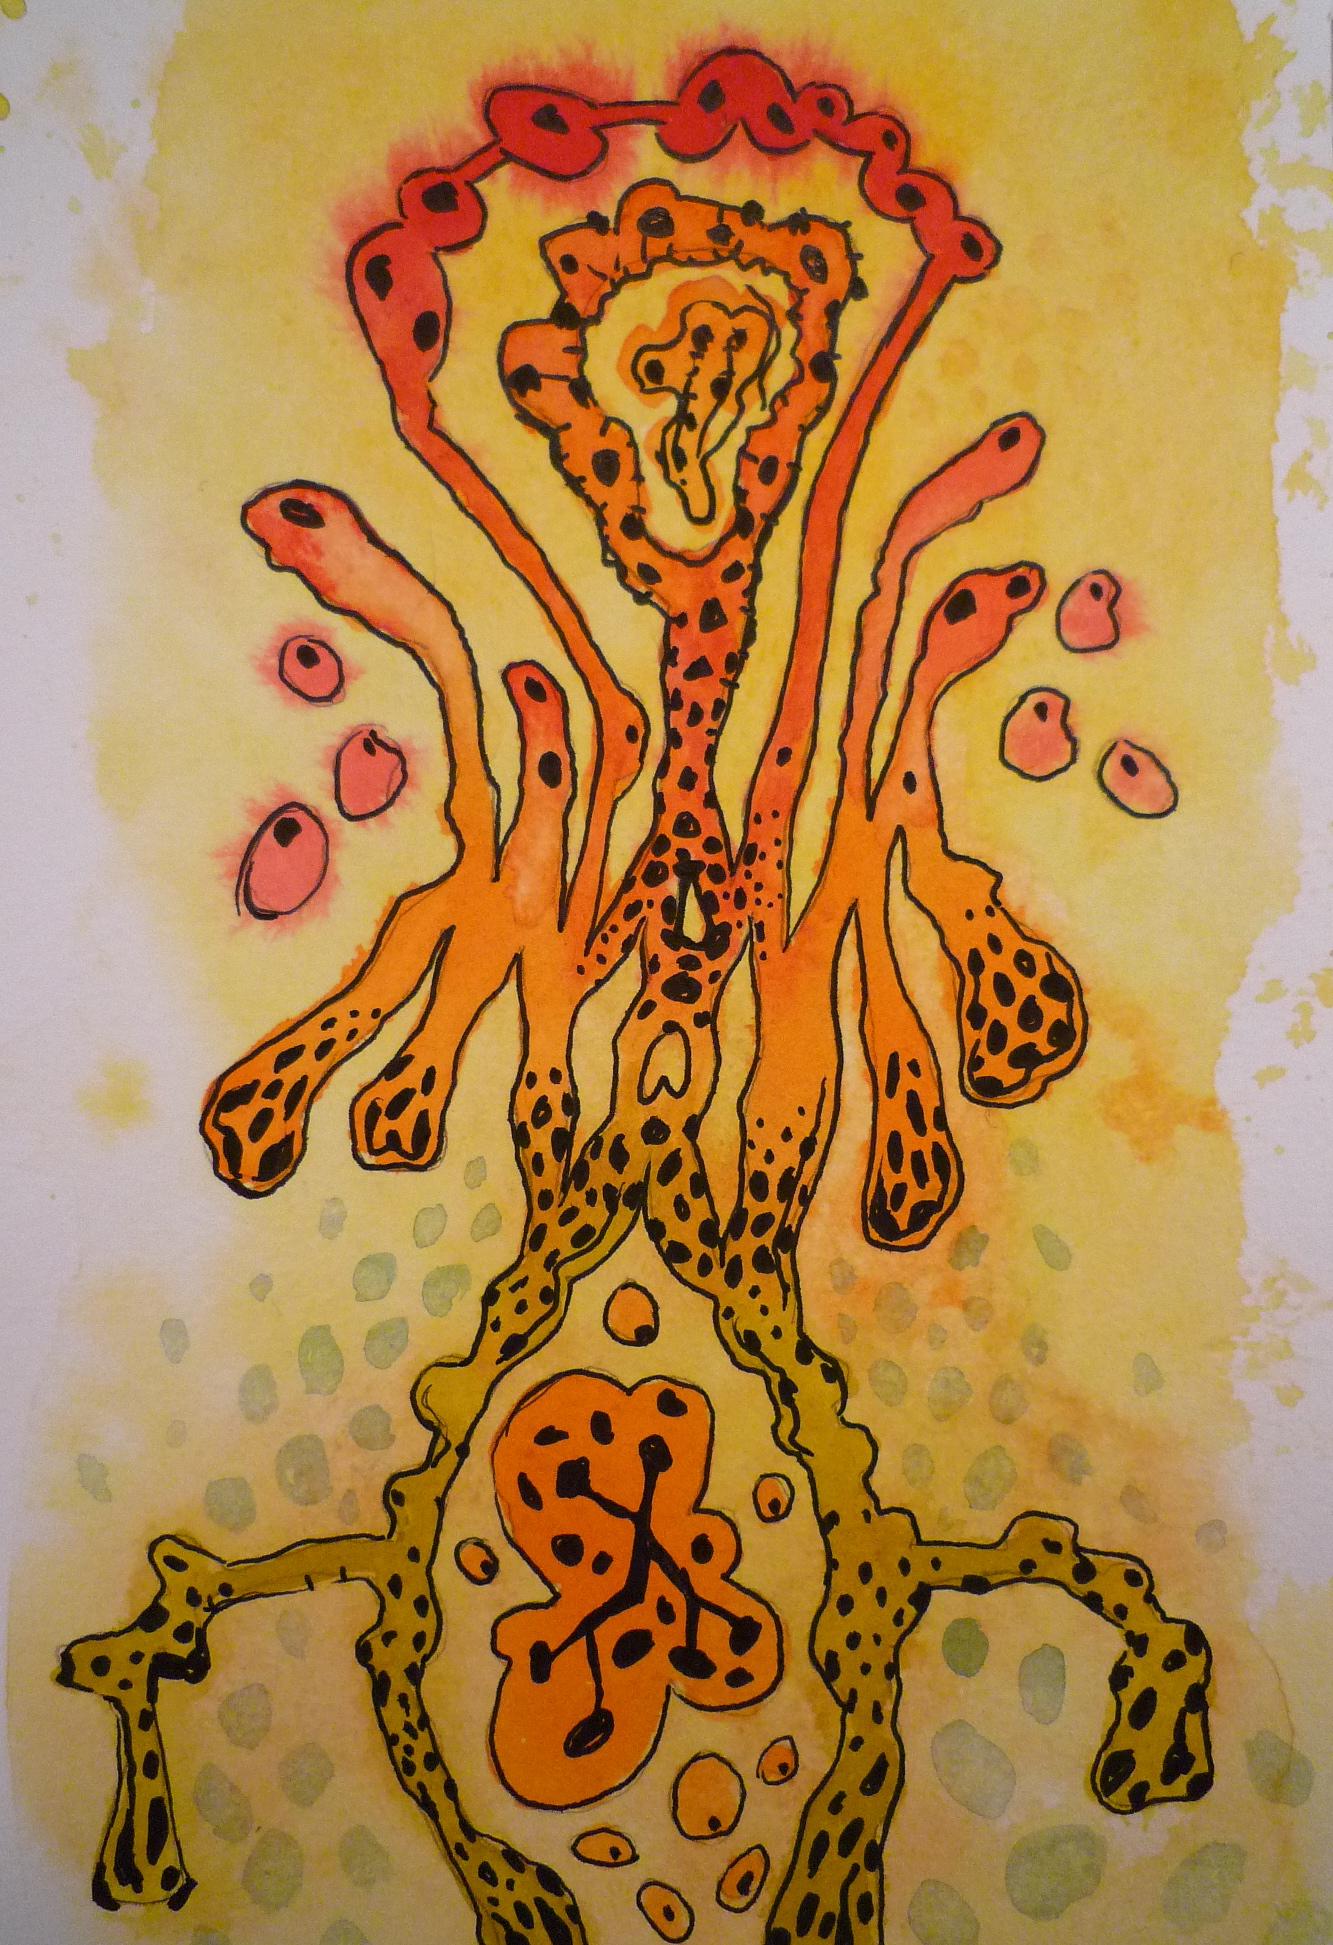 Sigil Amoeba